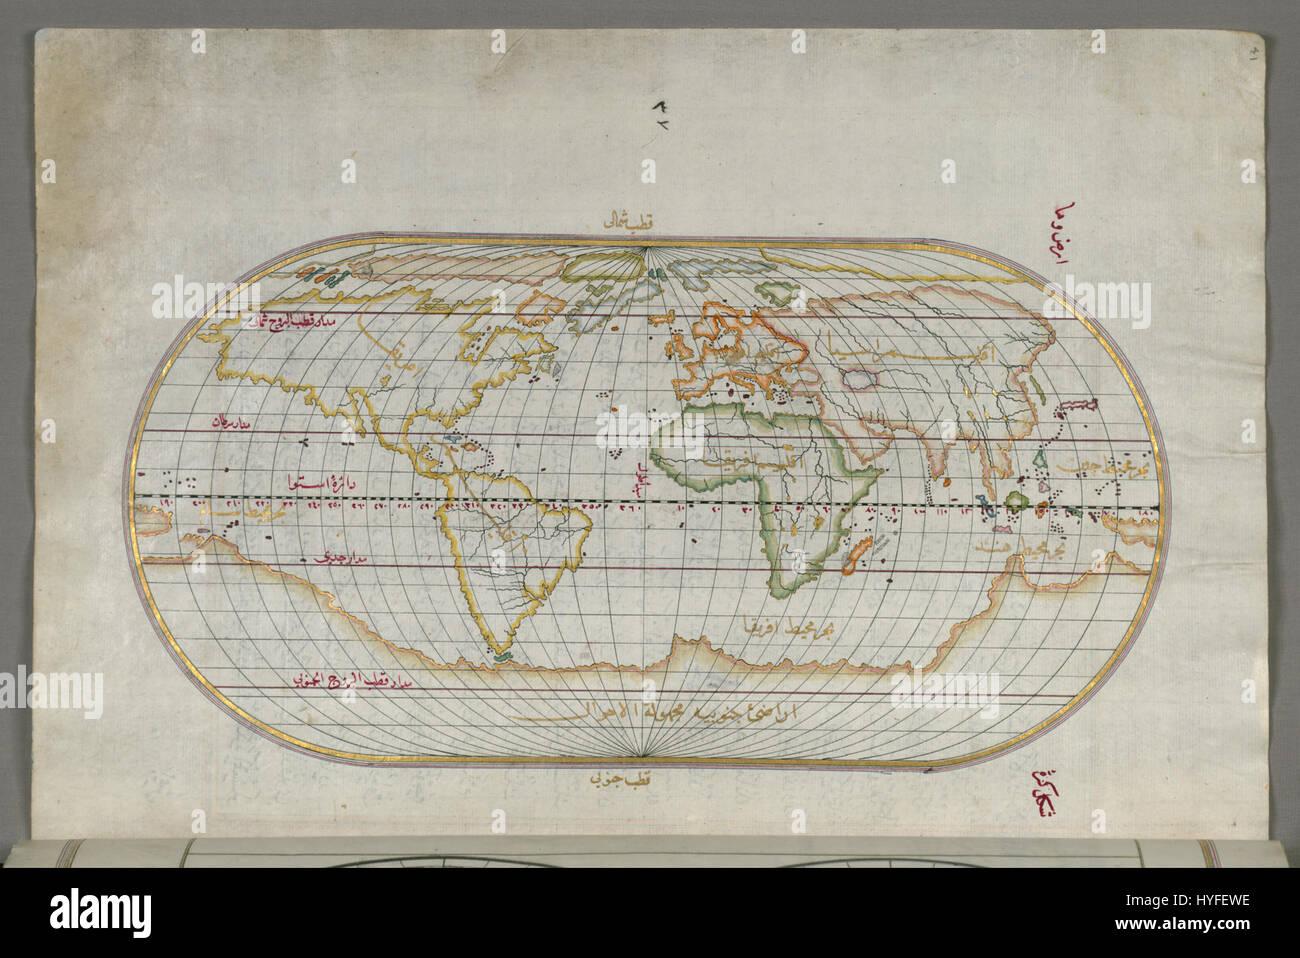 Piri reis oval world map google art project stock photo 137409258 piri reis oval world map google art project gumiabroncs Gallery